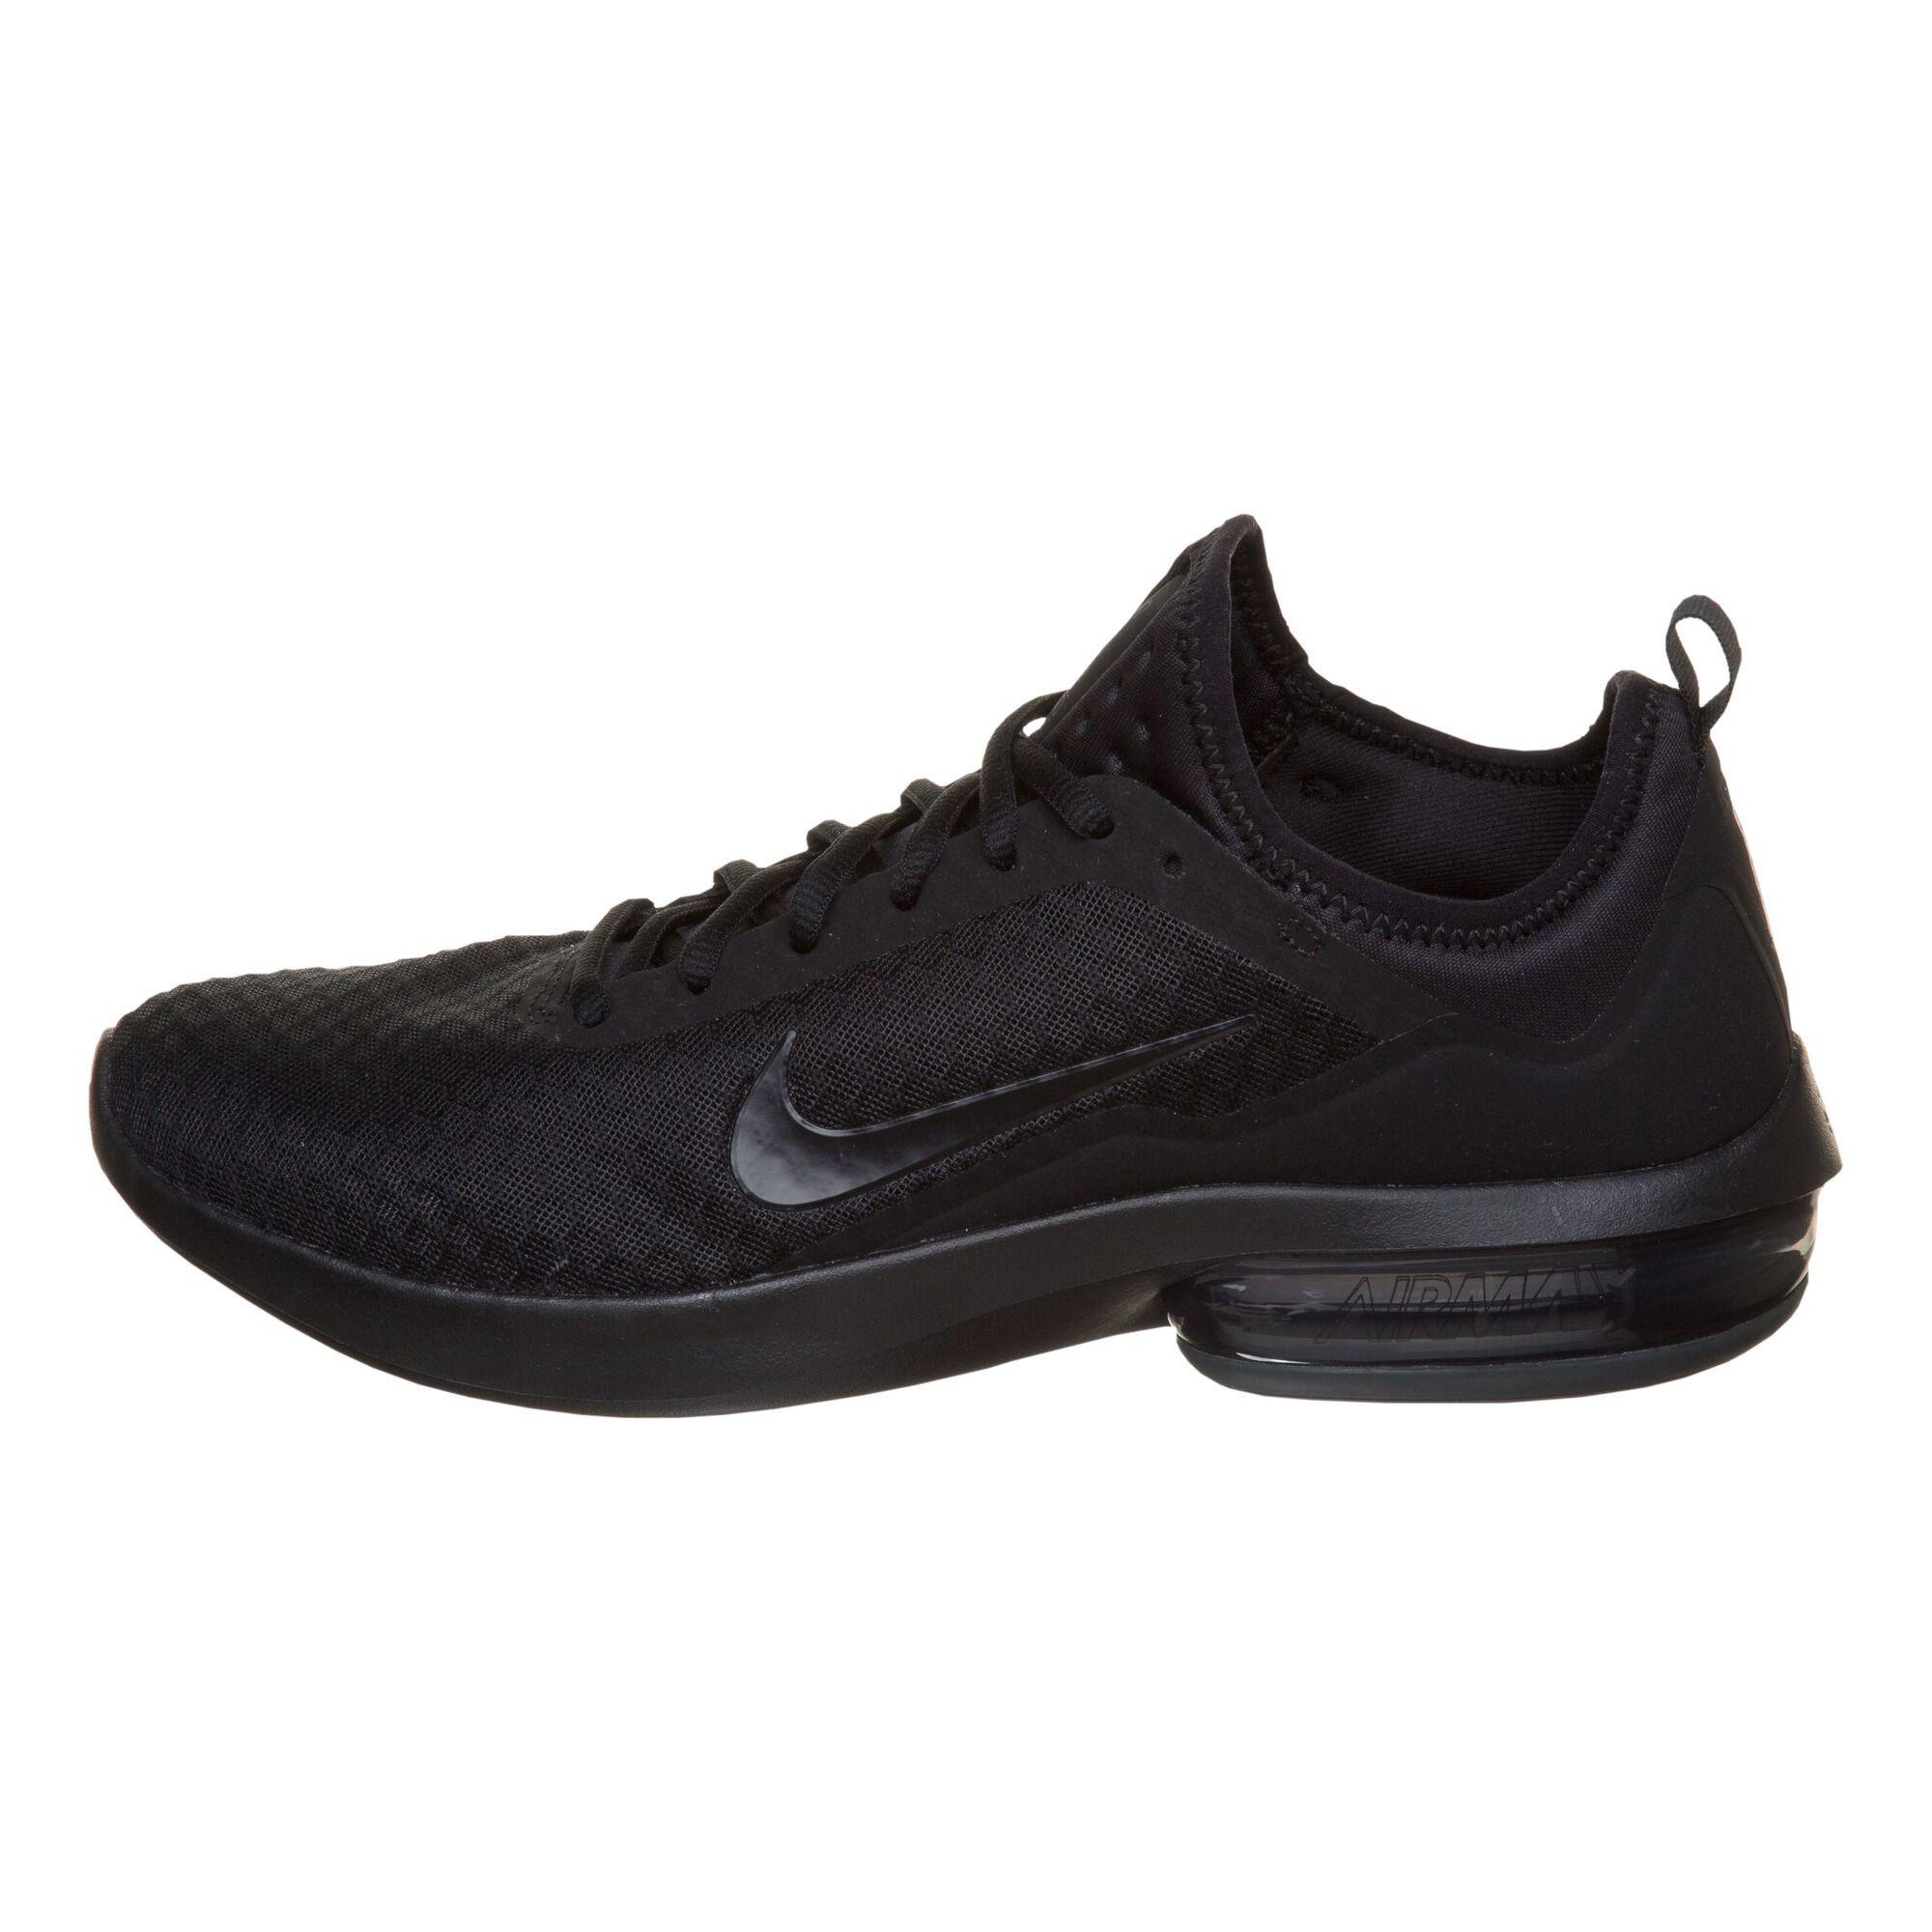 f75cc3b8947 Nike · Nike · Nike · Nike · Nike · Nike · Nike · Nike · Nike · Nike. Air  Max Kantara Men ...